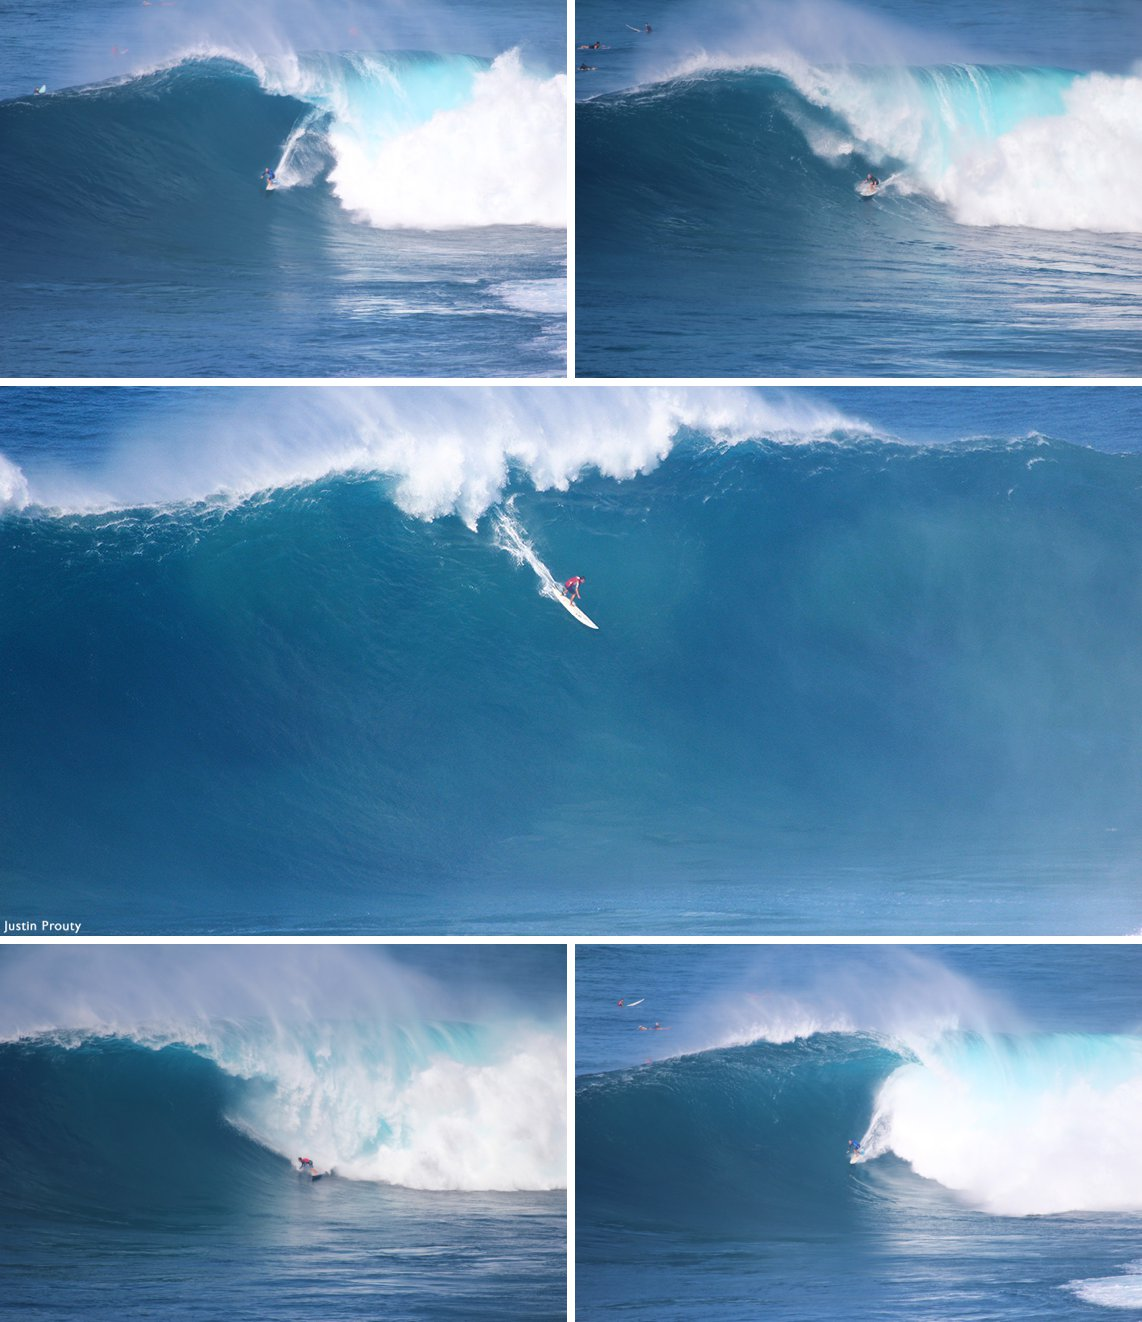 Peahi Jaws Maui